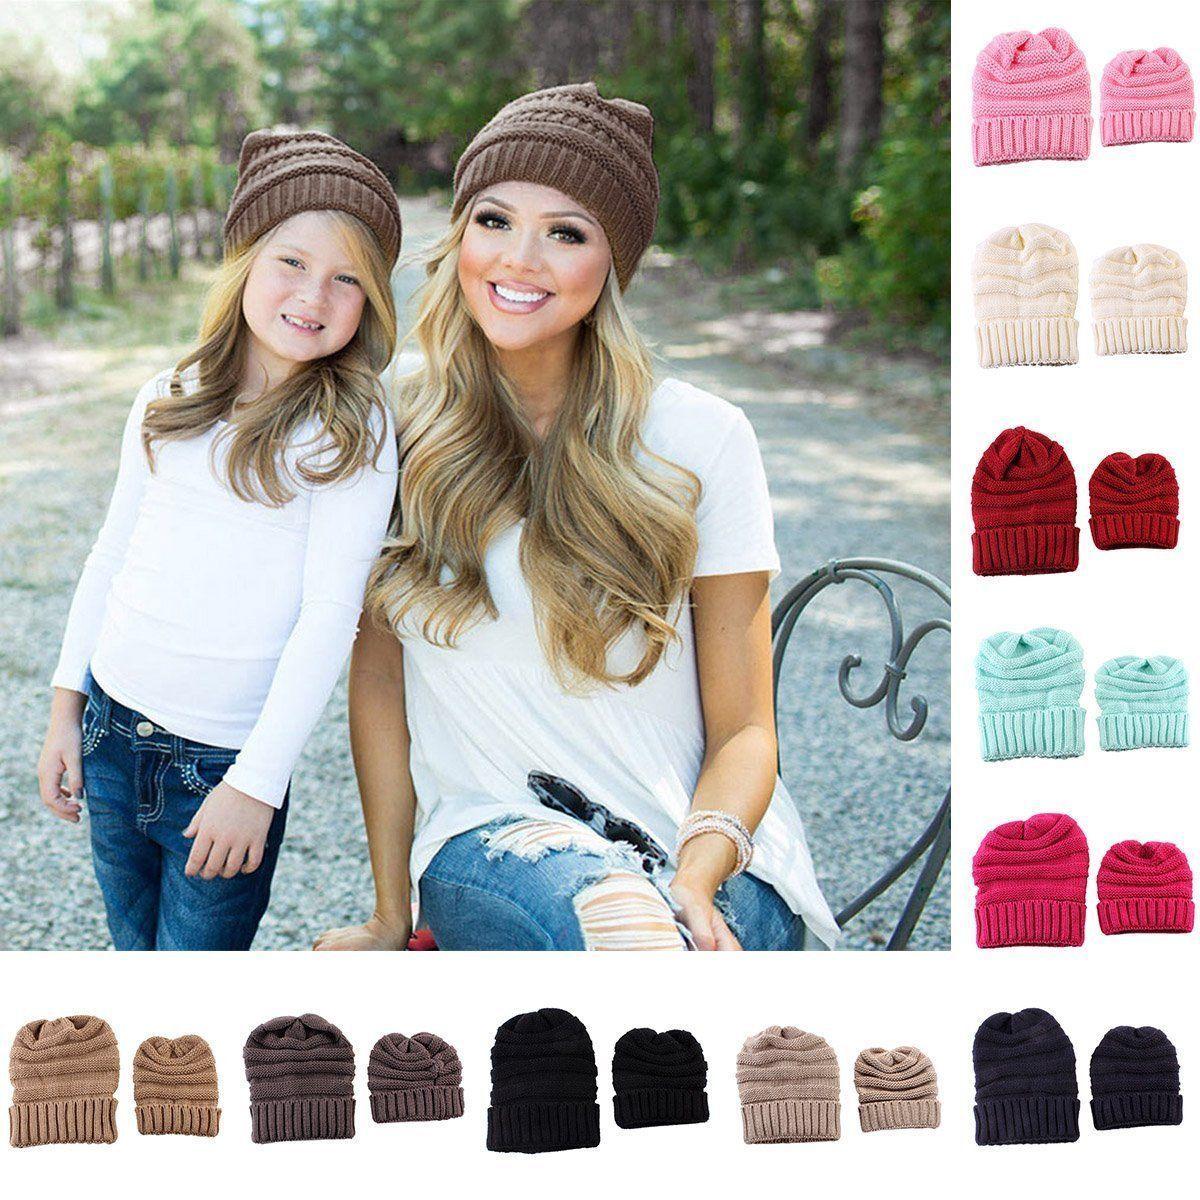 2Pcs Women Mom Mother Baby Child Warm Winter Knit Beanie Hat Crochet Ski  Cap Set b98028f1f33